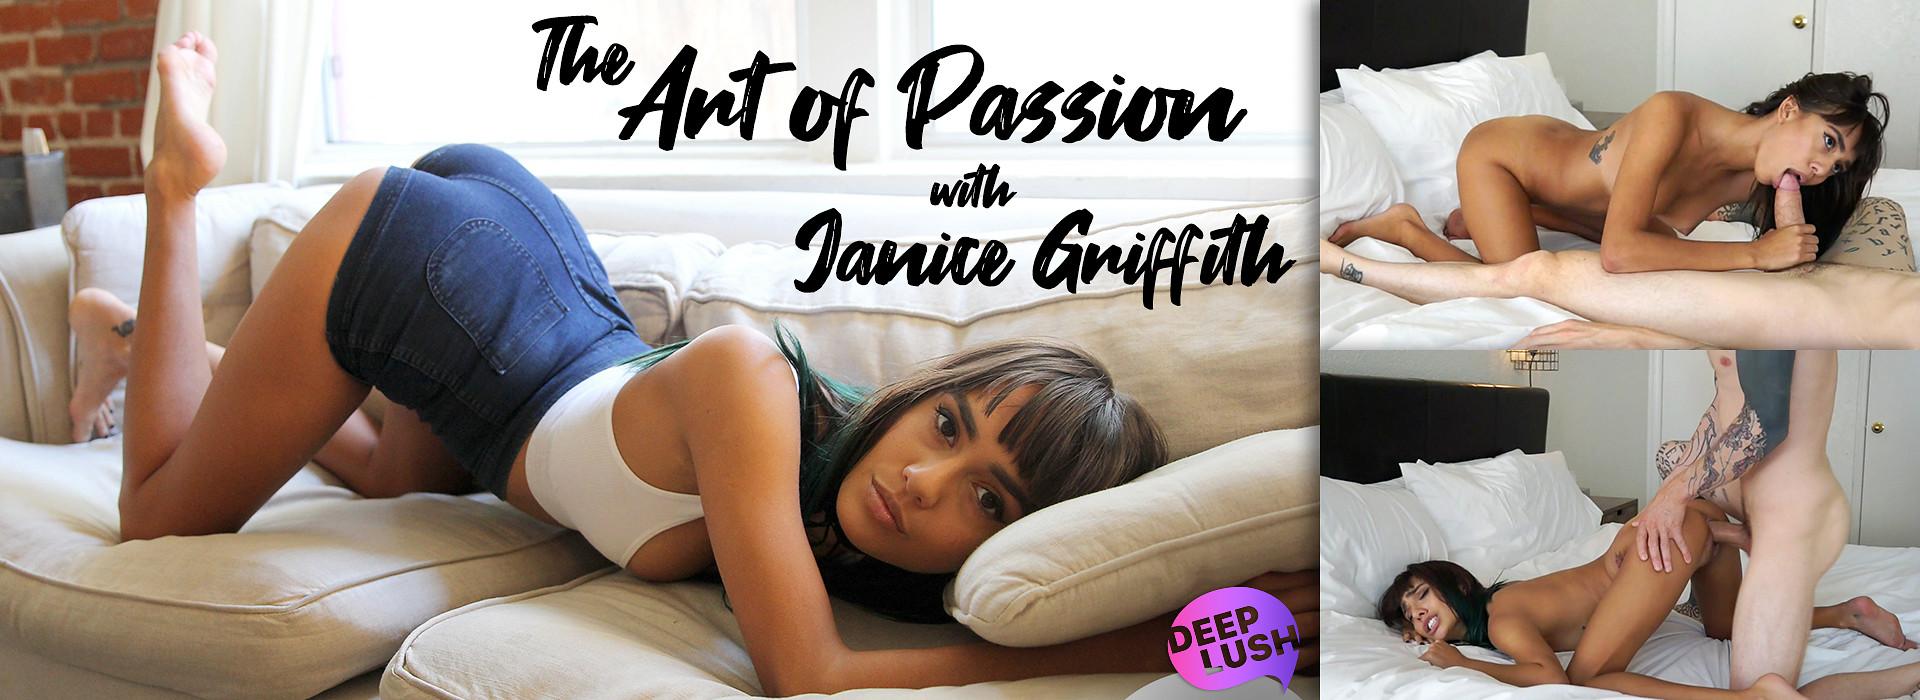 DeepLush - The Art of Passion